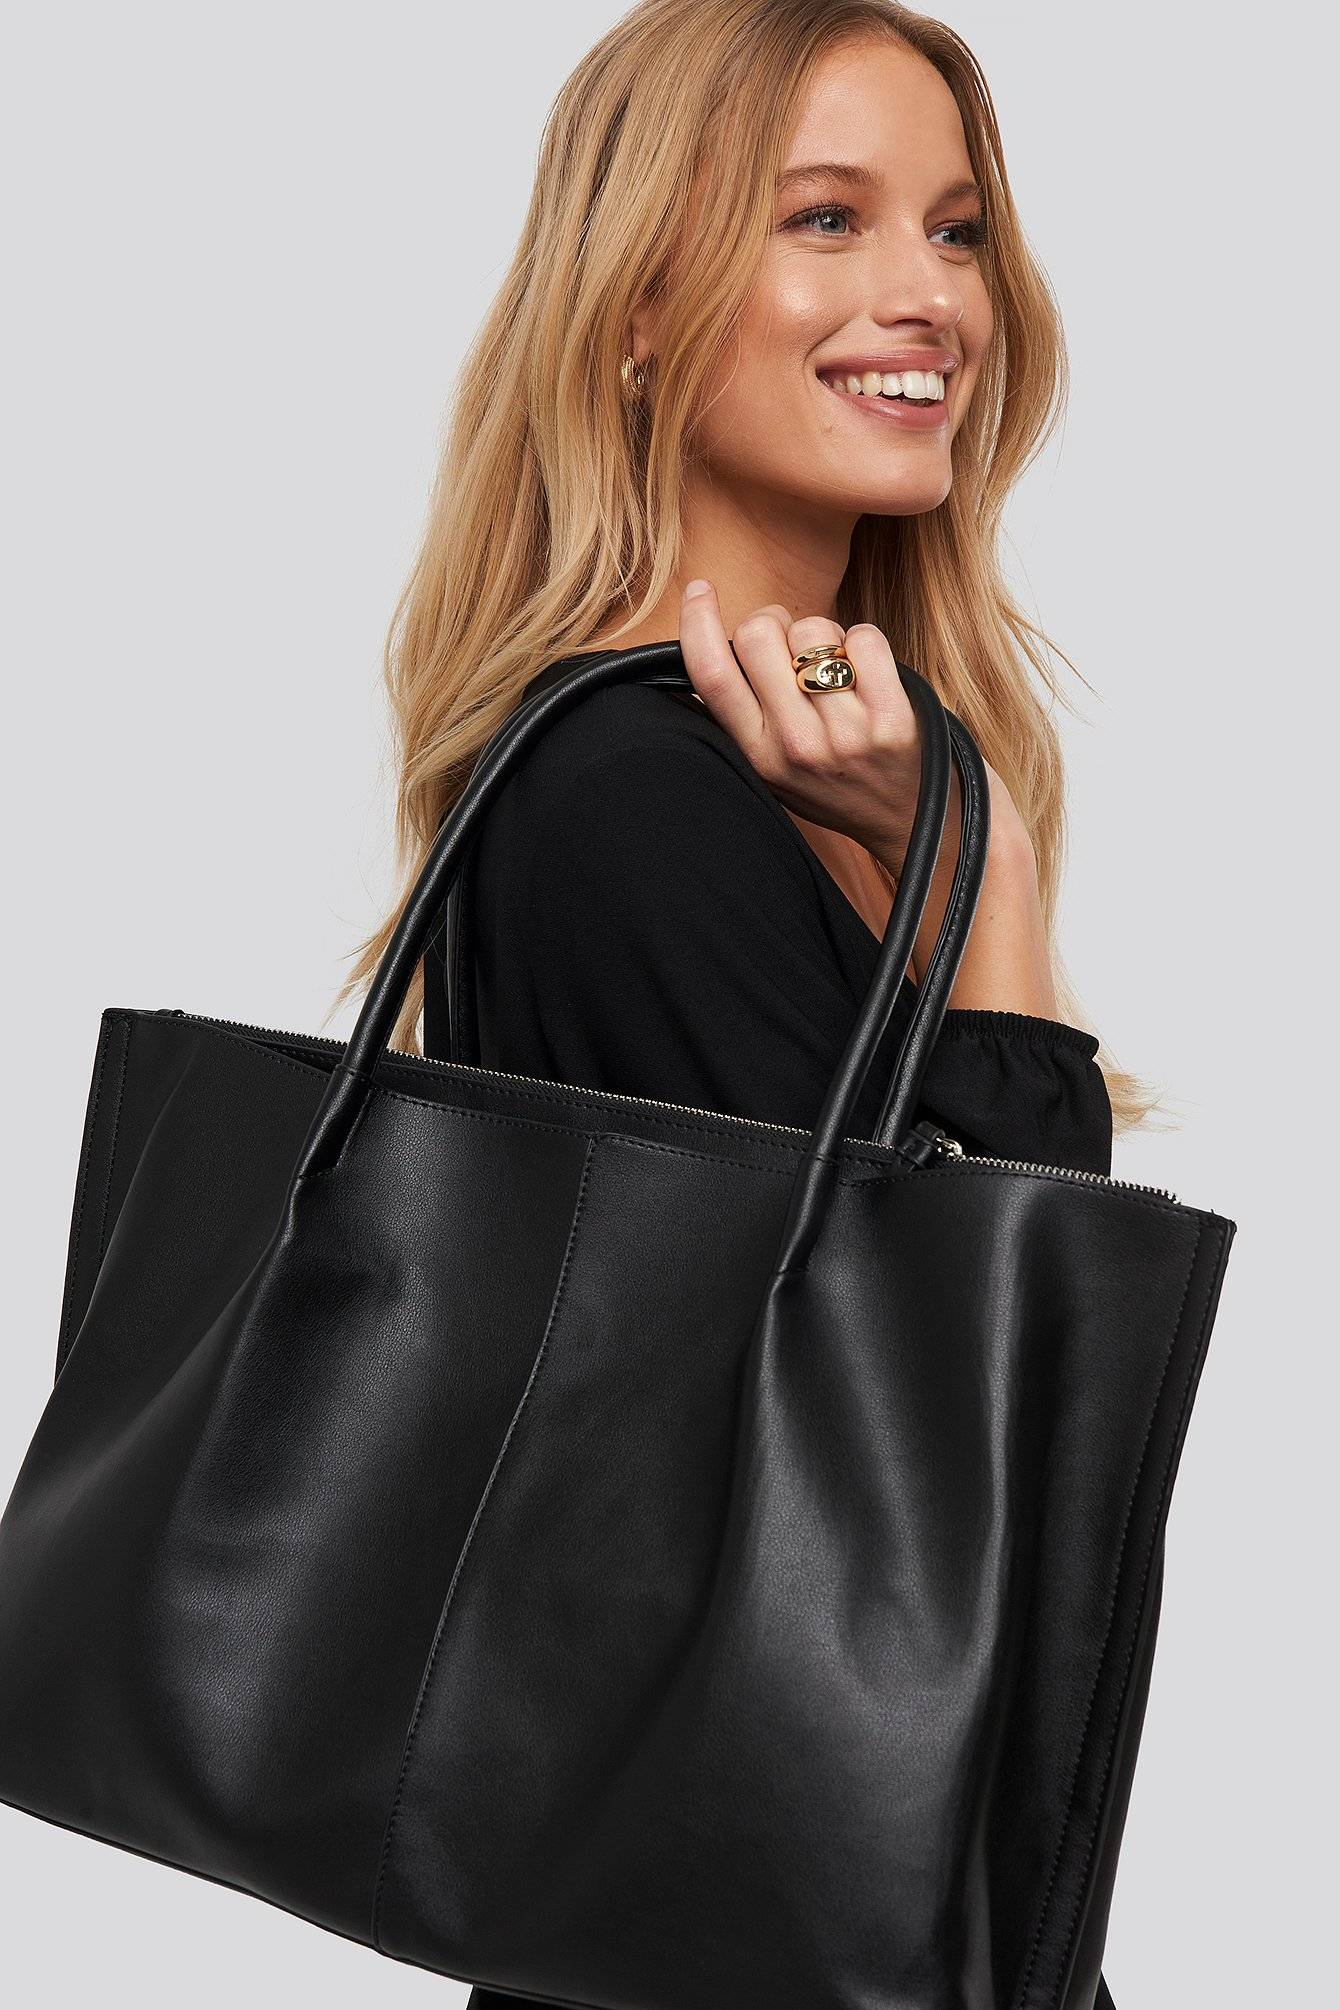 NA-KD Accessories Slim Handle Shopper - Black